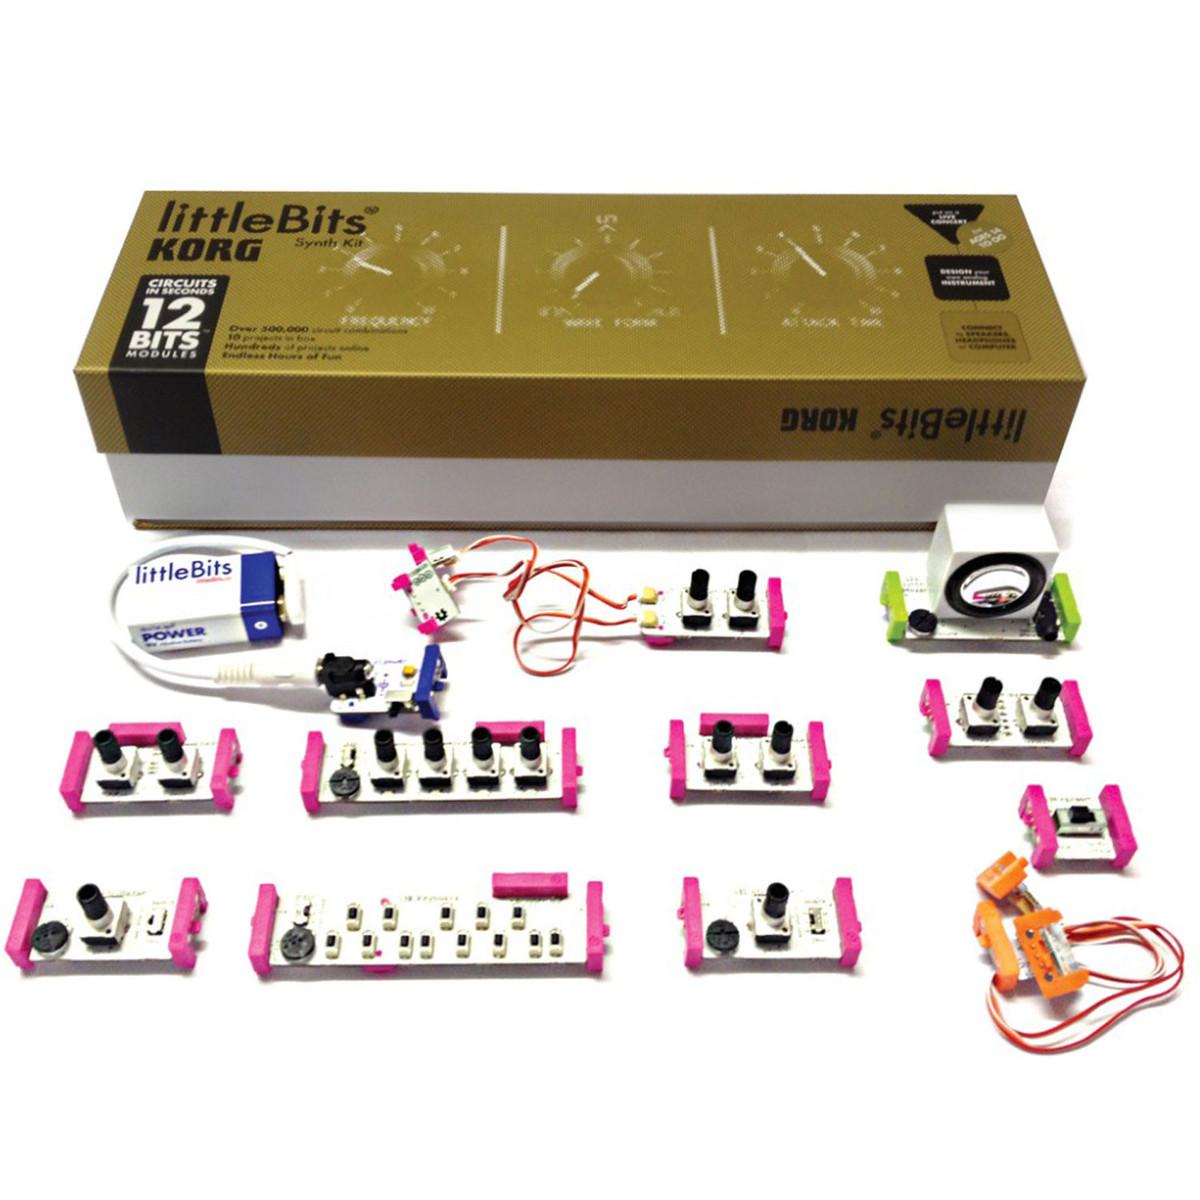 korg littlebits analog synth kit at gear4music. Black Bedroom Furniture Sets. Home Design Ideas